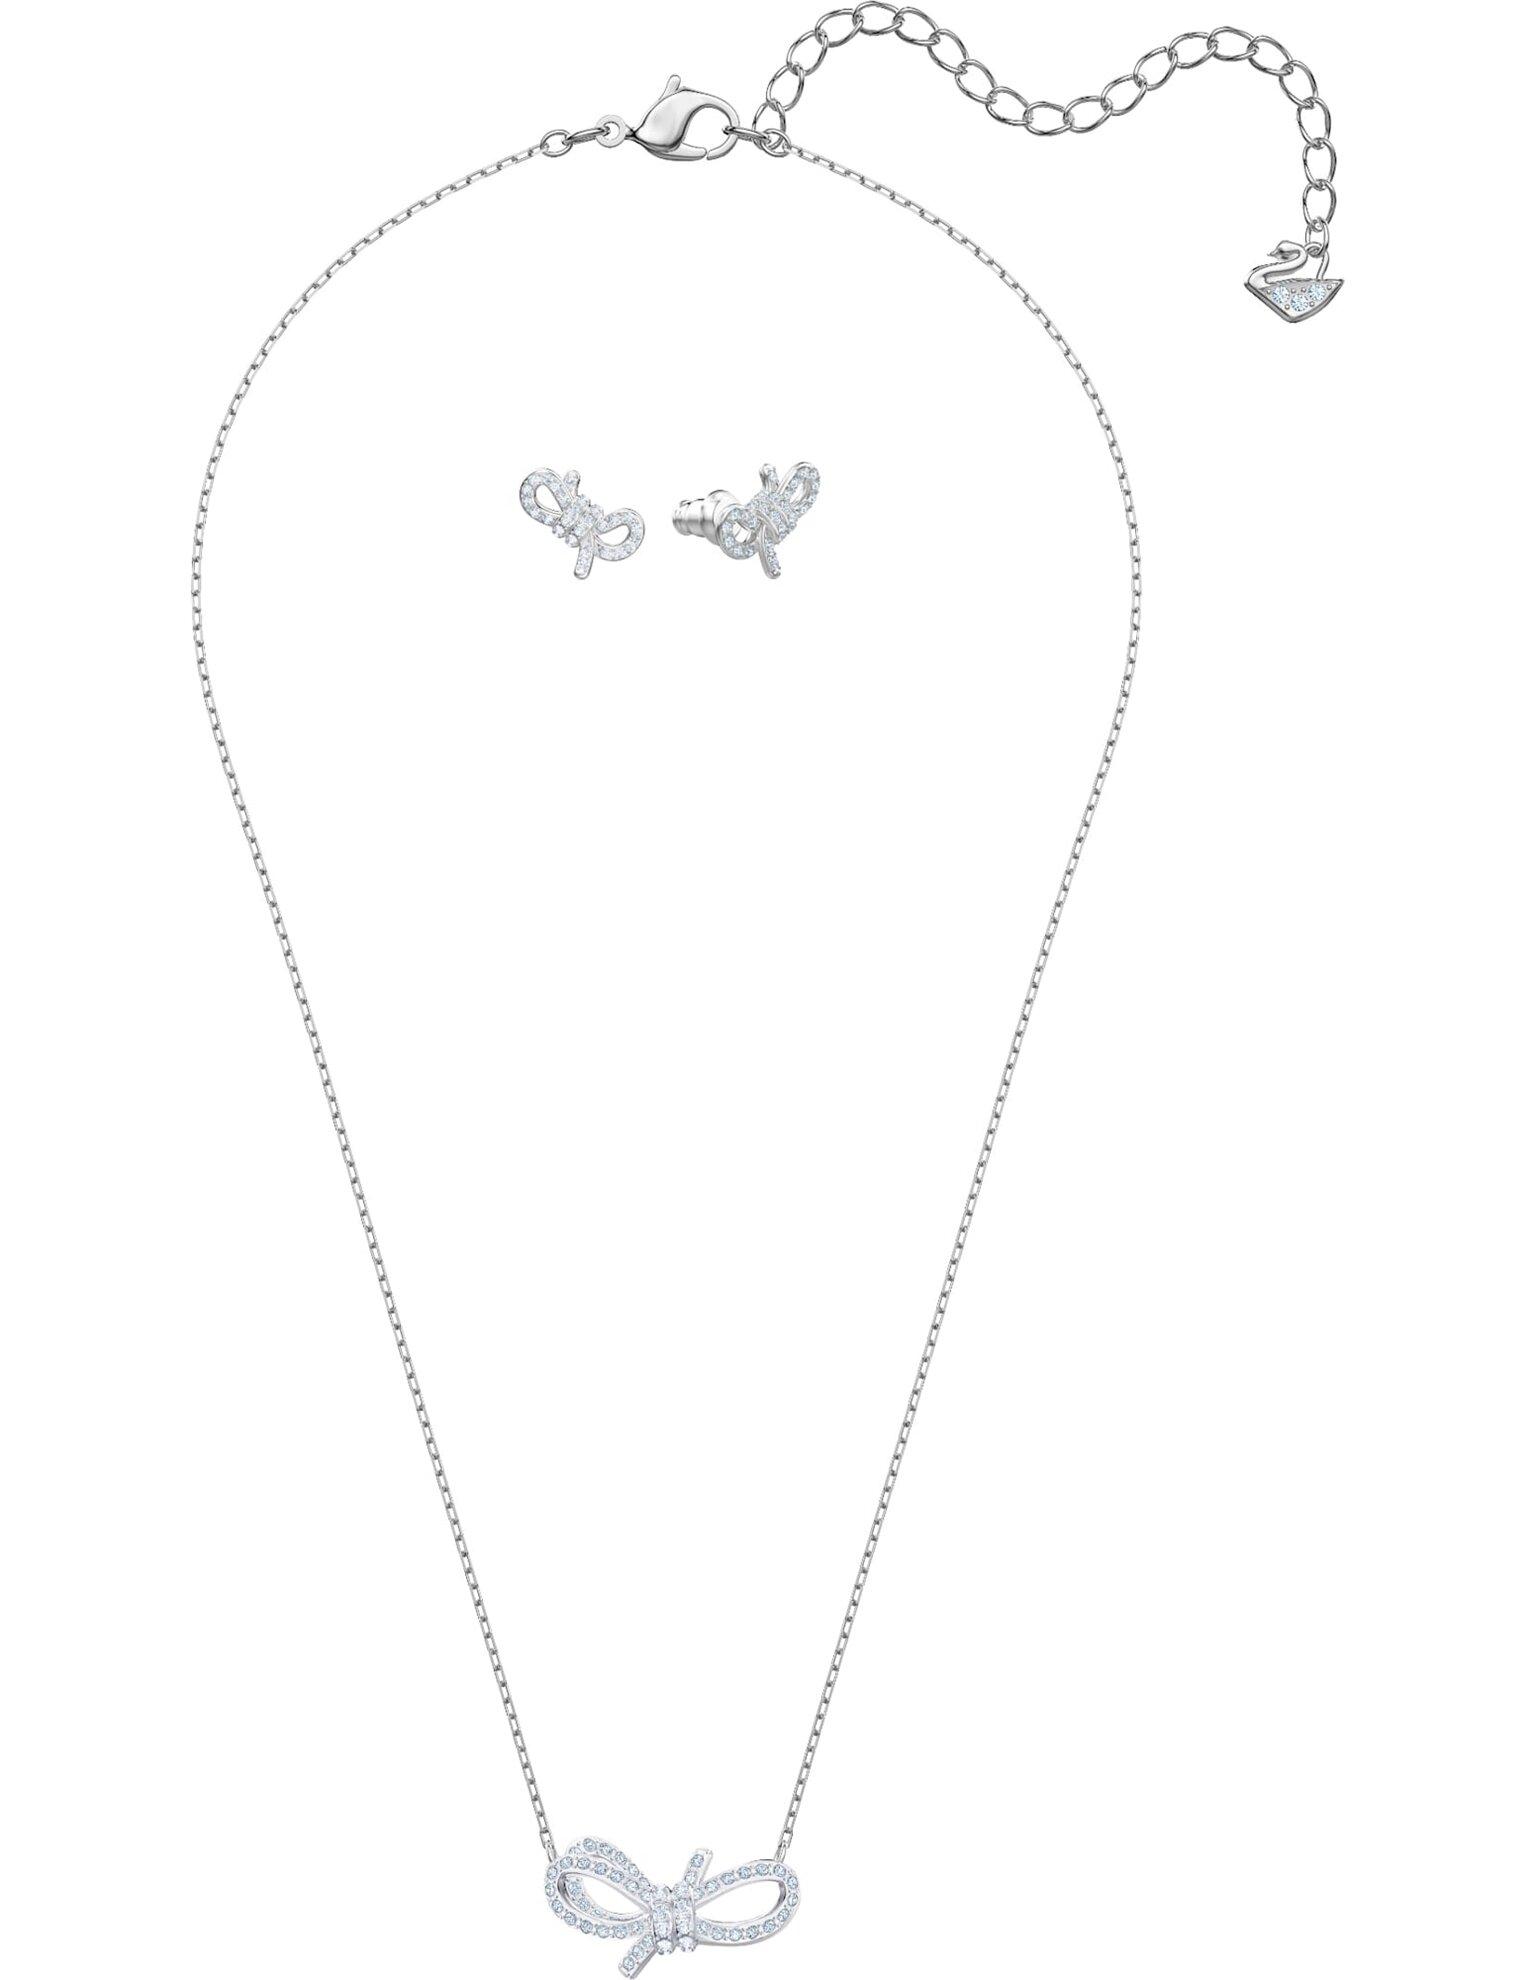 Picture of Lifelong Bow Set, Beyaz, Rodyum kaplama